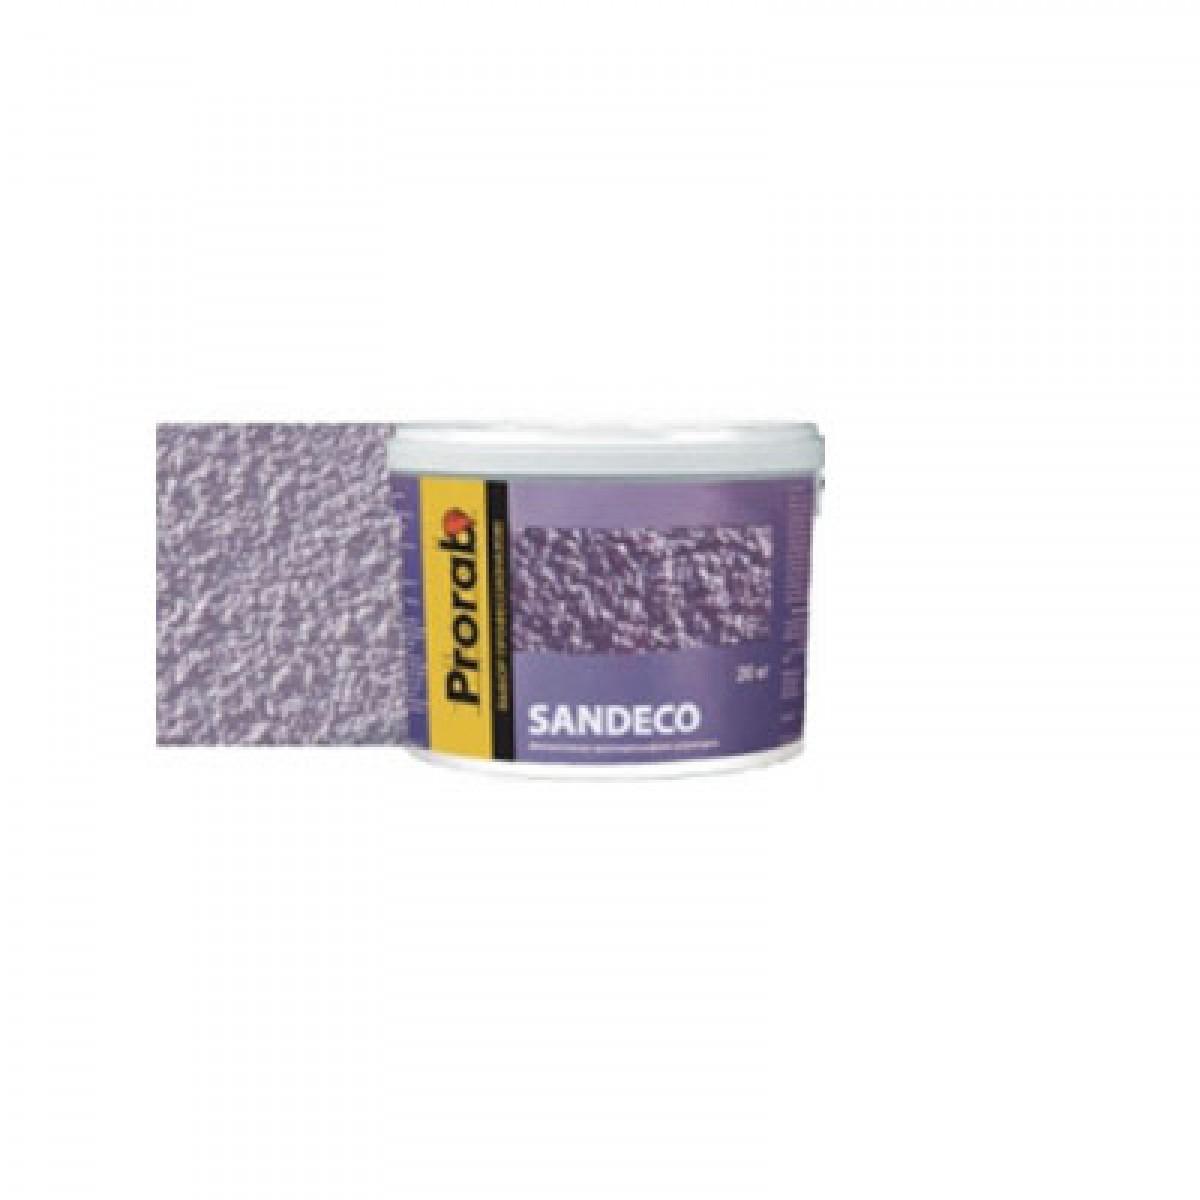 Sandeco